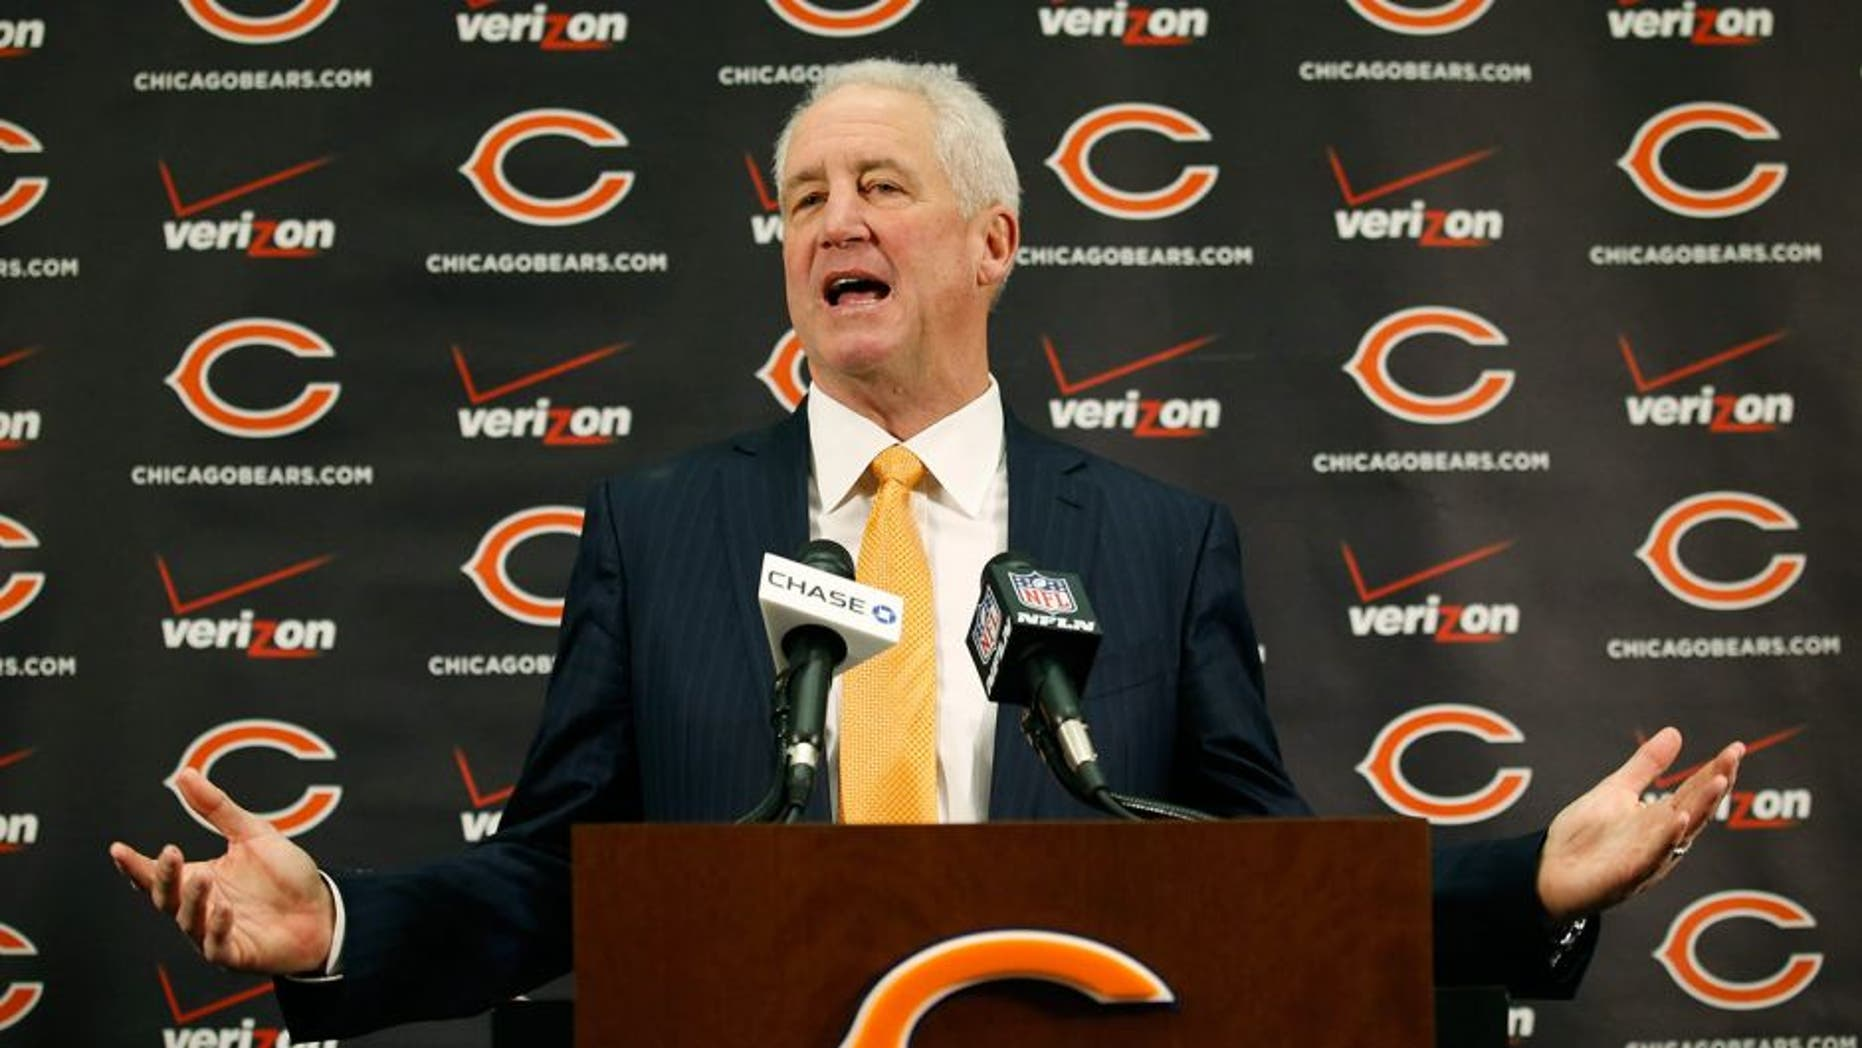 Jan 19, 2015; Lake Forest, IL, USA; New Chicago Bears head coach John Fox speaks during a press conference at Mugs Halas Auditorium. Mandatory Credit: Kamil Krzaczynski-USA TODAY Sports